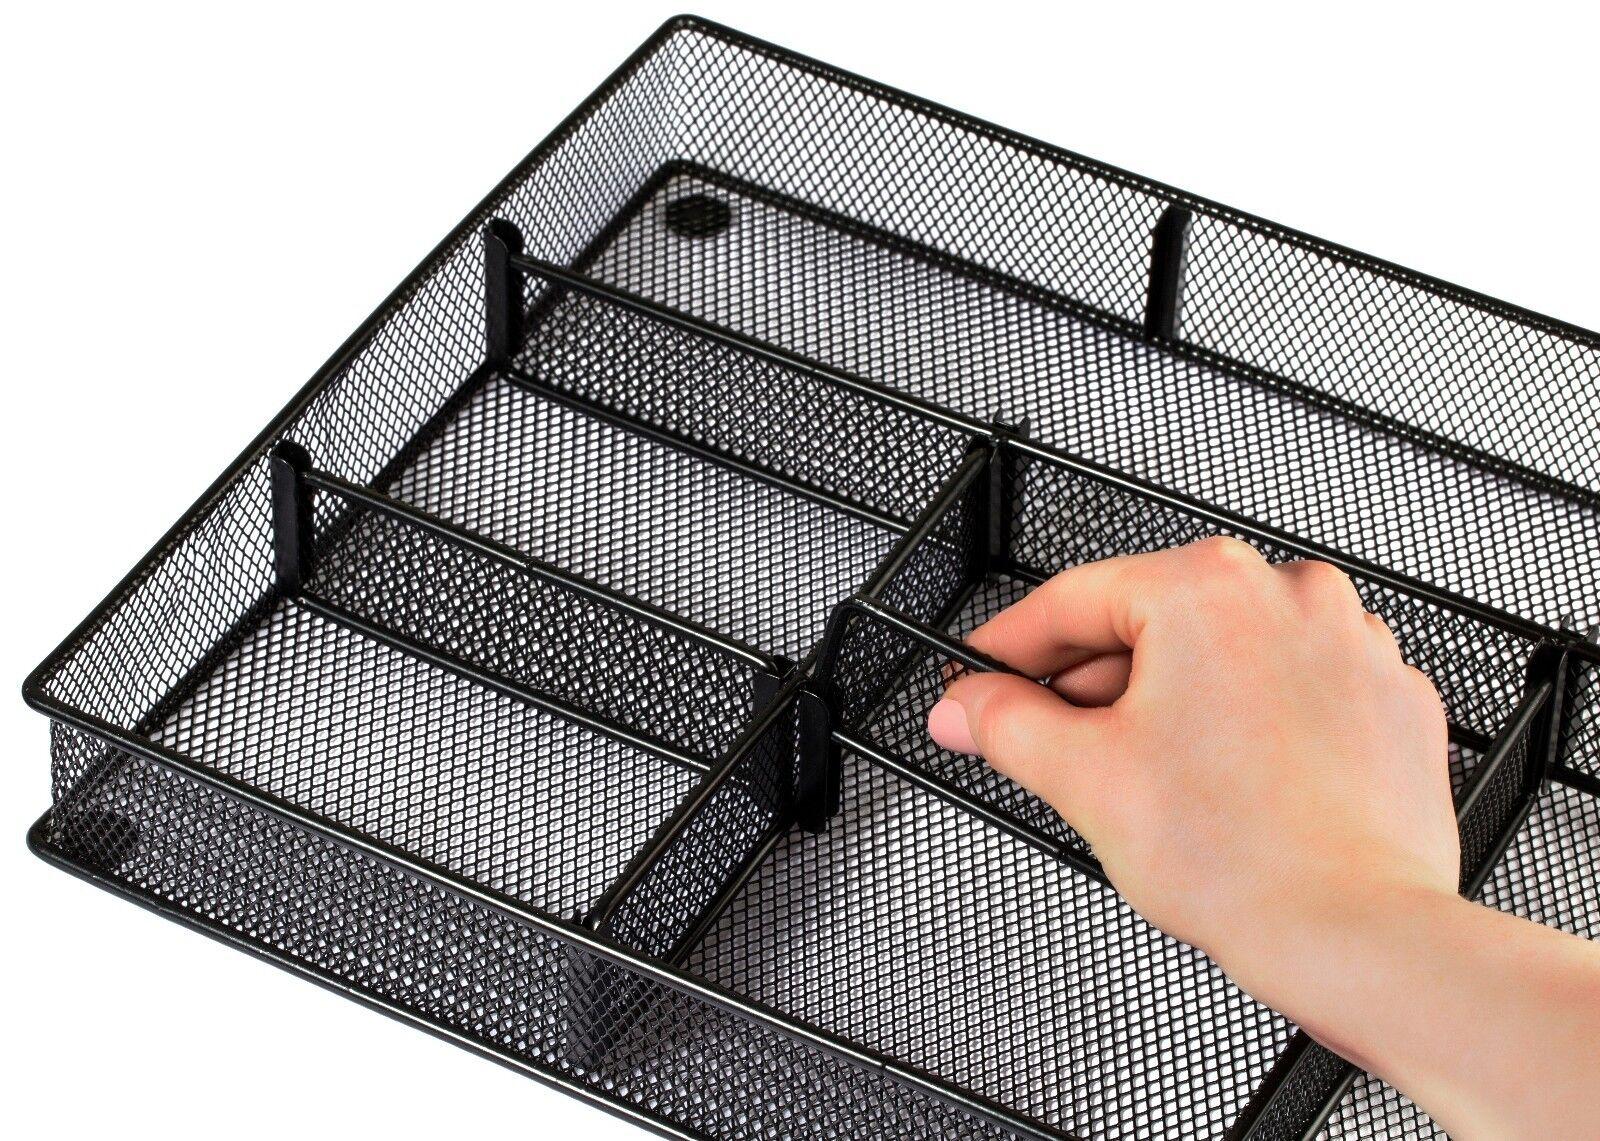 Adjustable Metal Drawer Organizer - 20 Dividers for Custom T